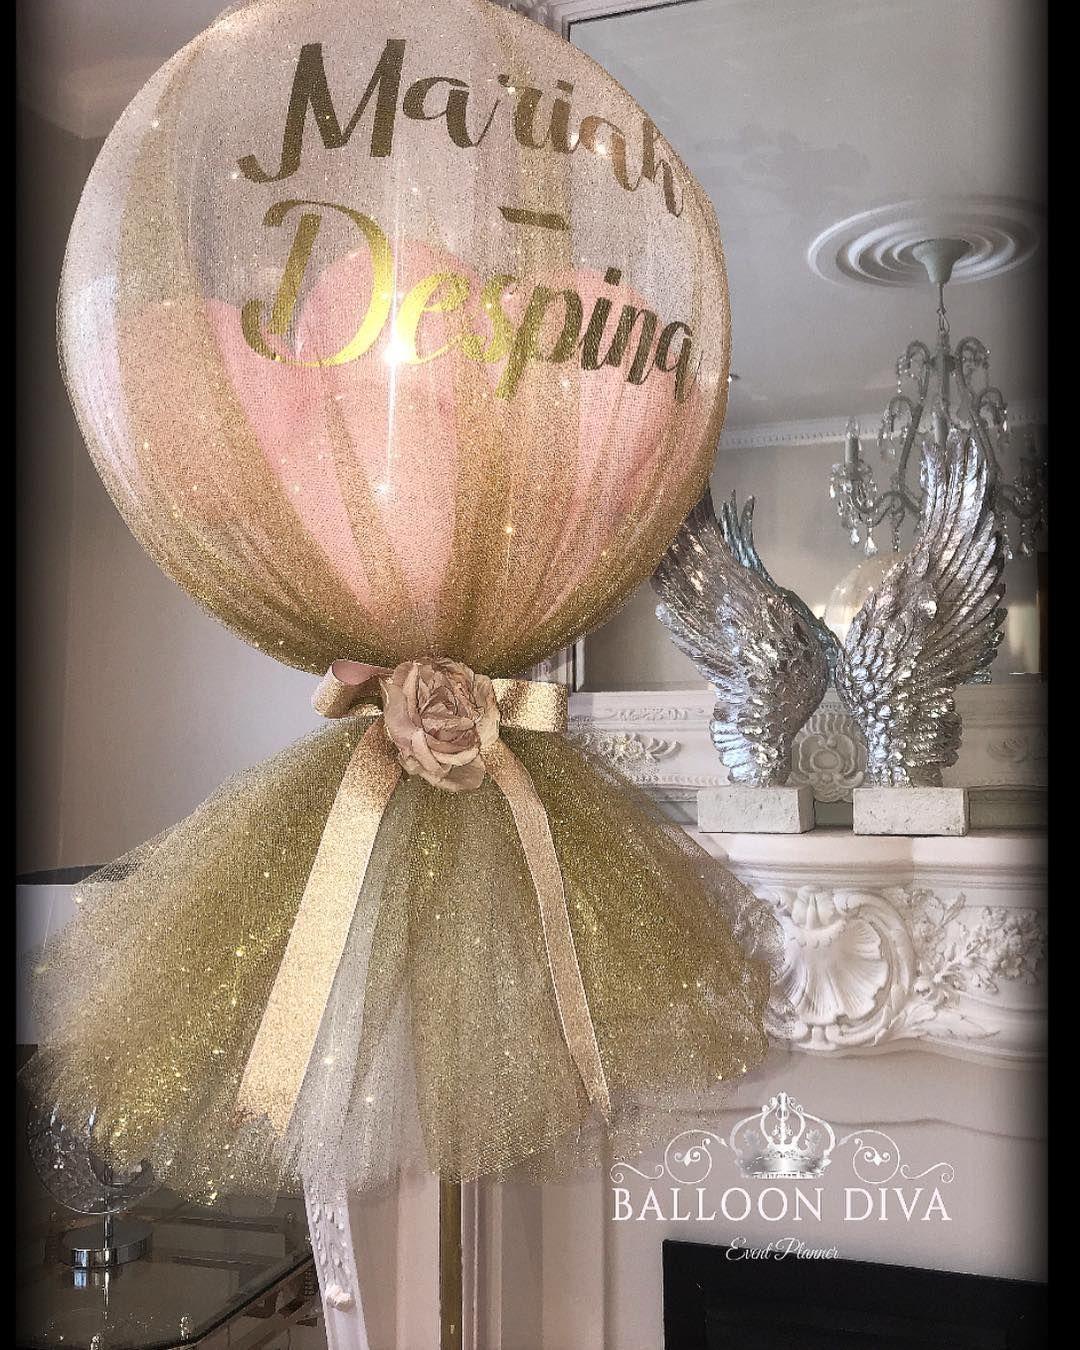 Image may contain indoor Balloons, Balloon centerpieces